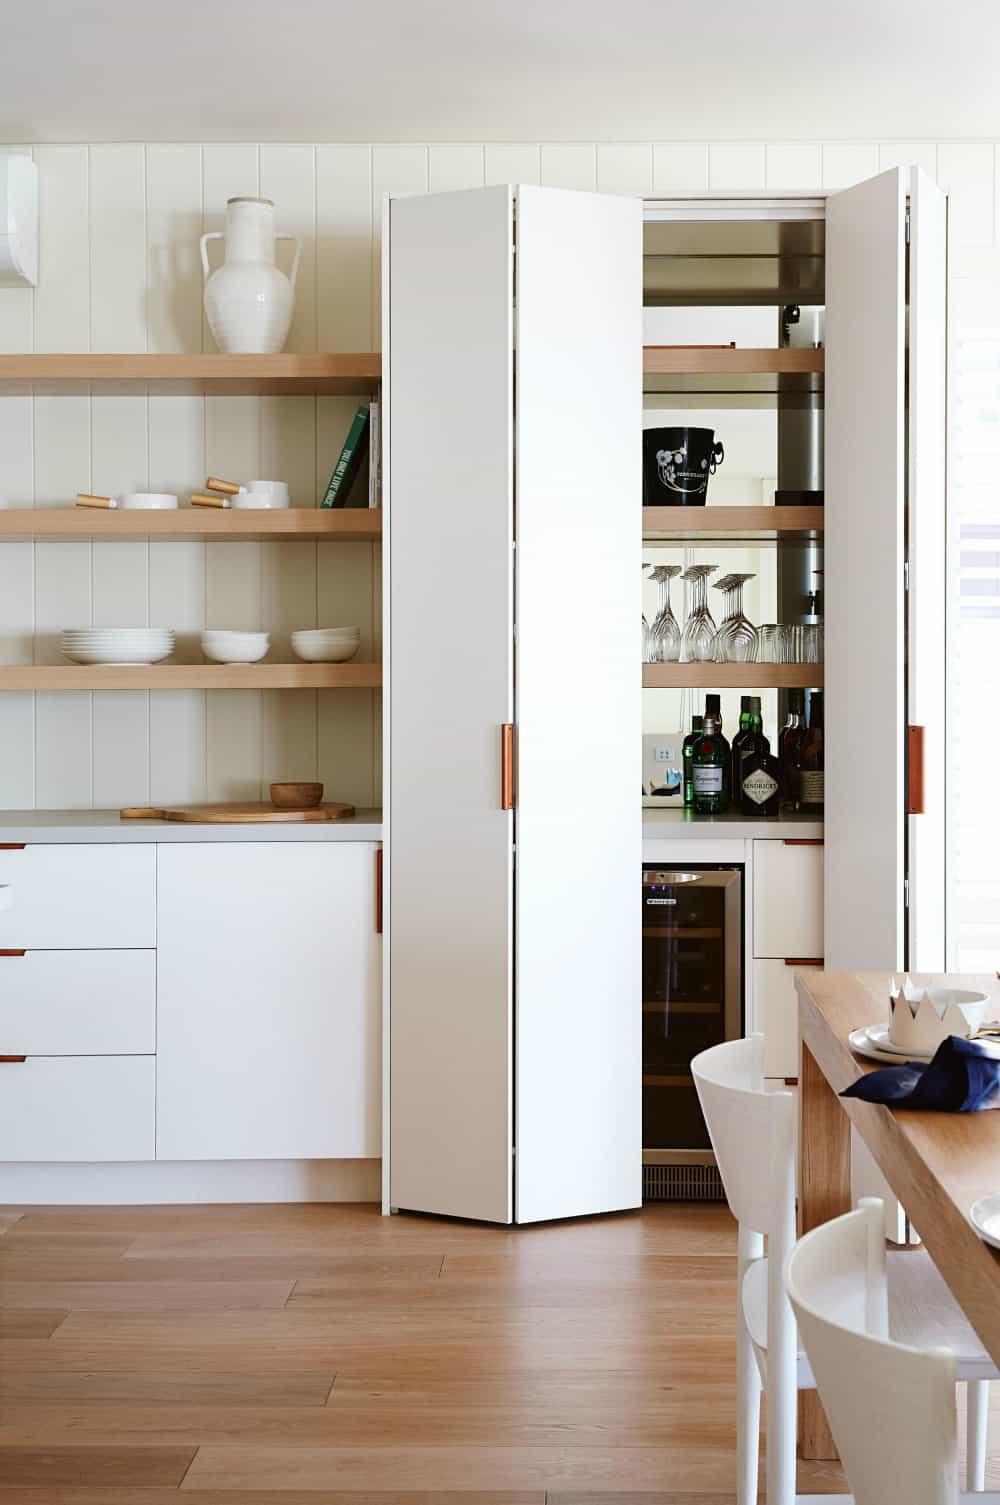 Sleek kitchen pantry